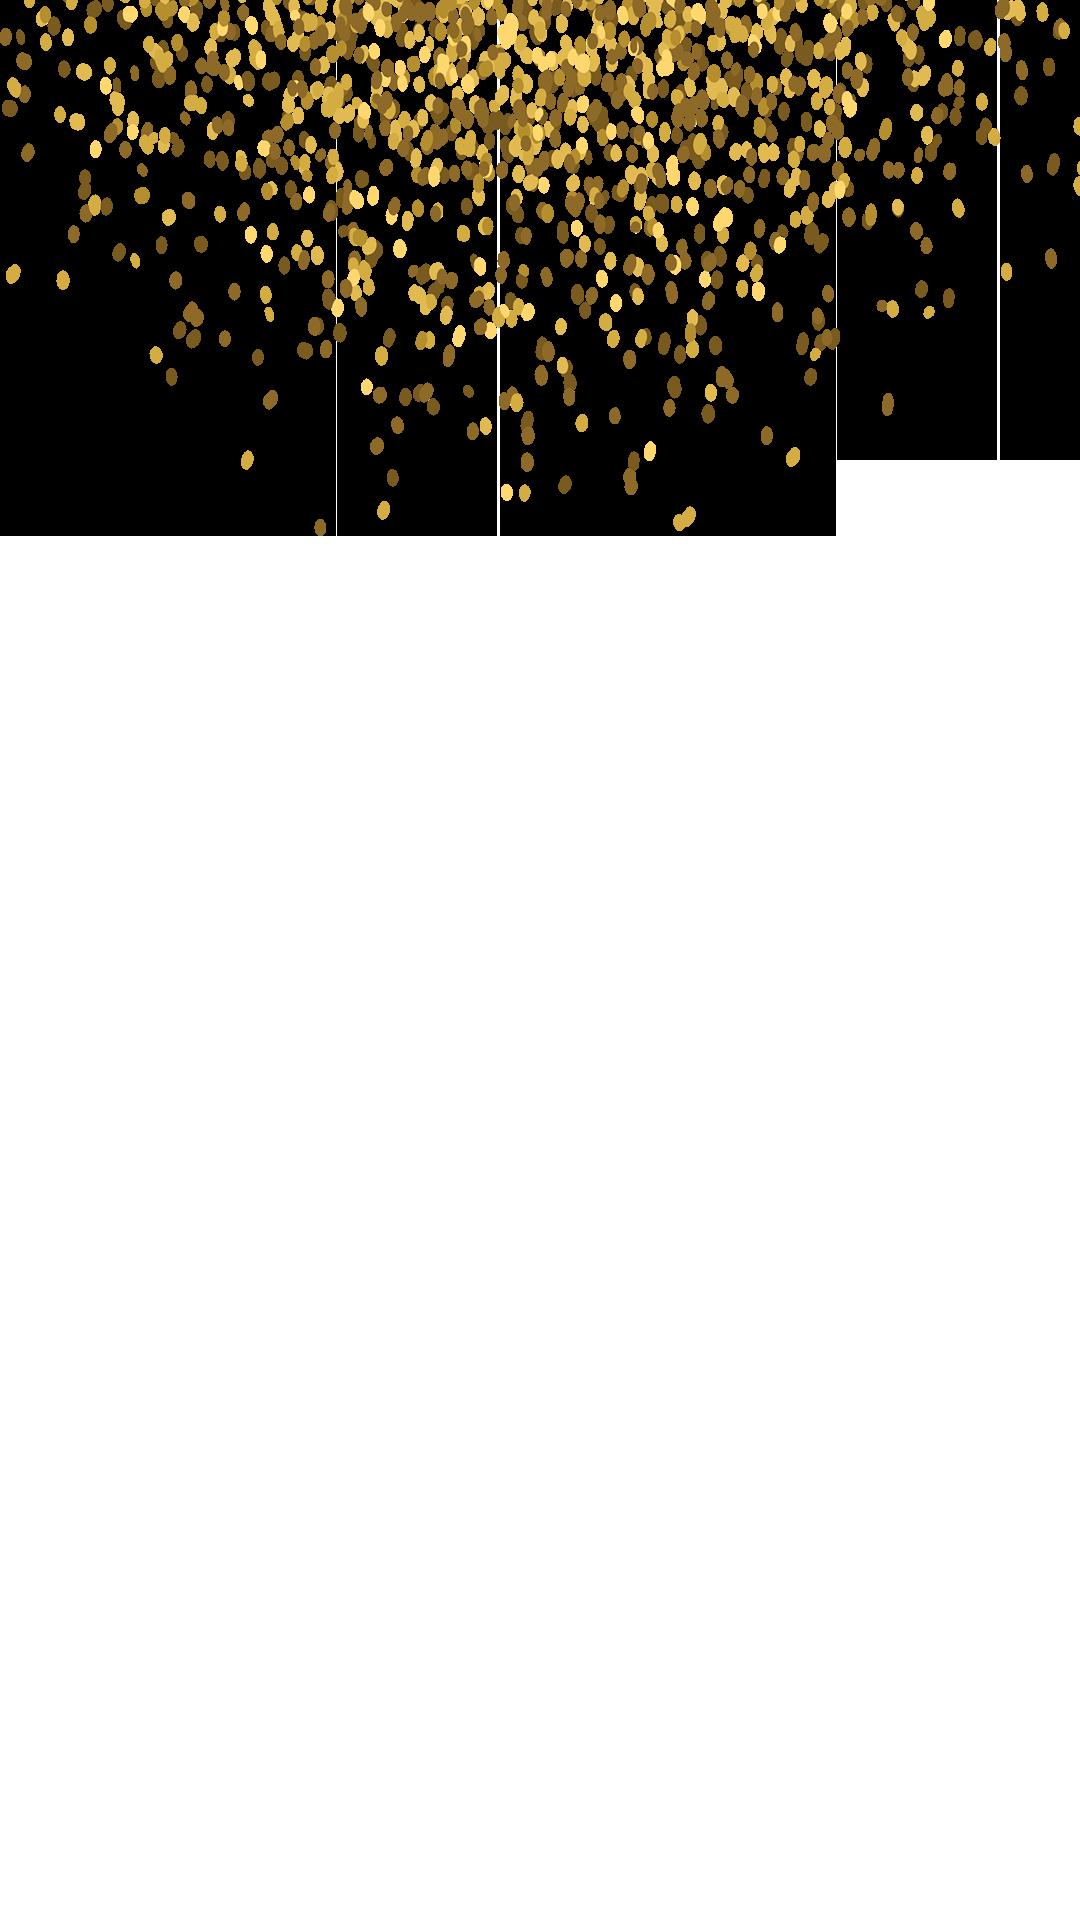 glitter gold sorority snapchat filter geofilter maker on Stars Clip Art Tea Party Sparkle Clip Art